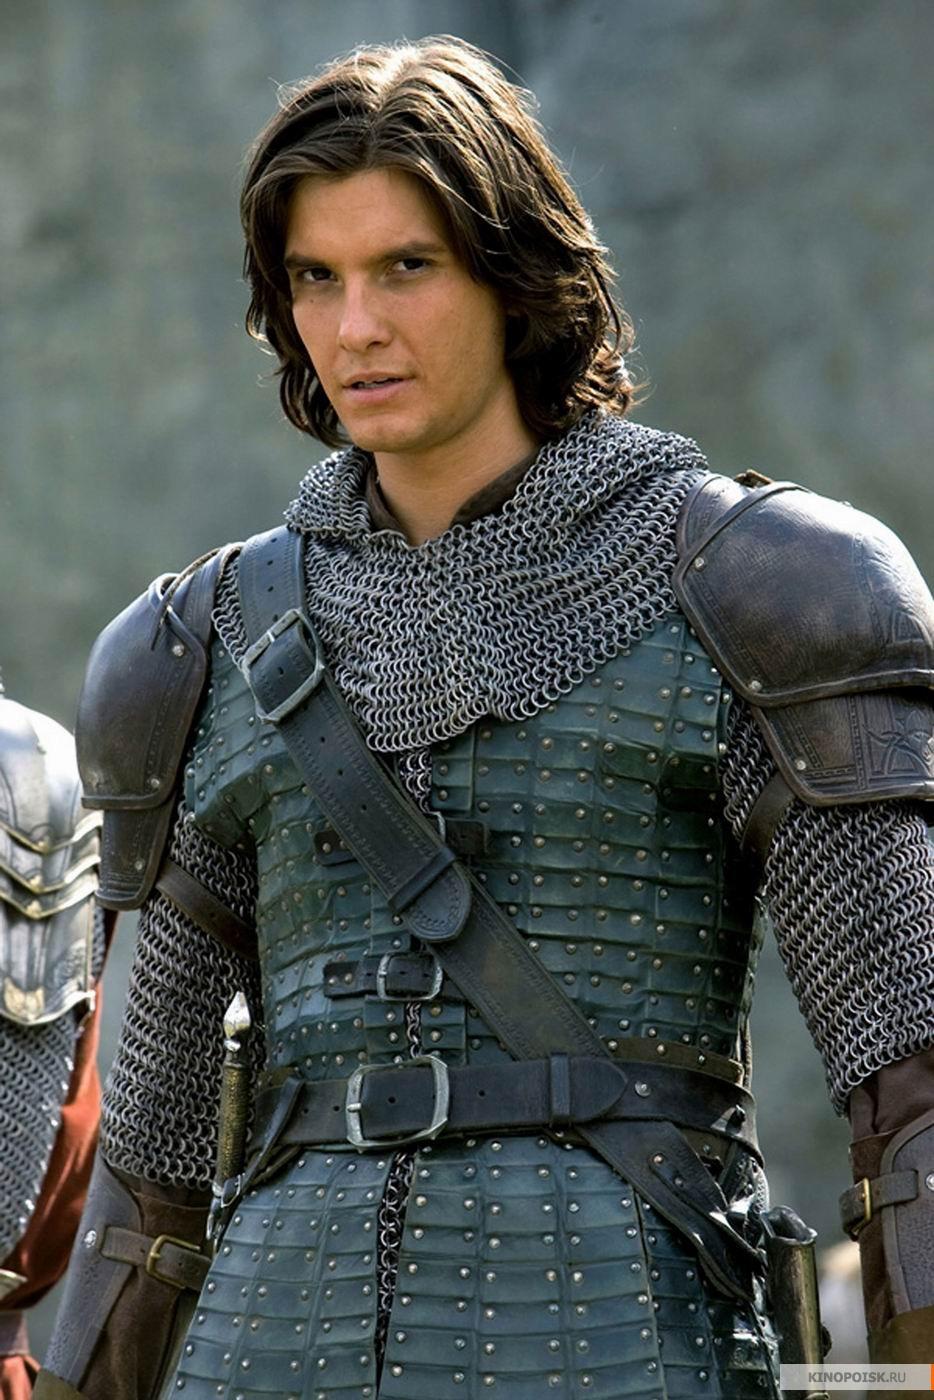 http://st.kinopoisk.ru/im/kadr/6/6/5/kinopoisk.ru-Chronicles-of-Narnia_3A-Prince-Caspian_2C-The-665497.jpg